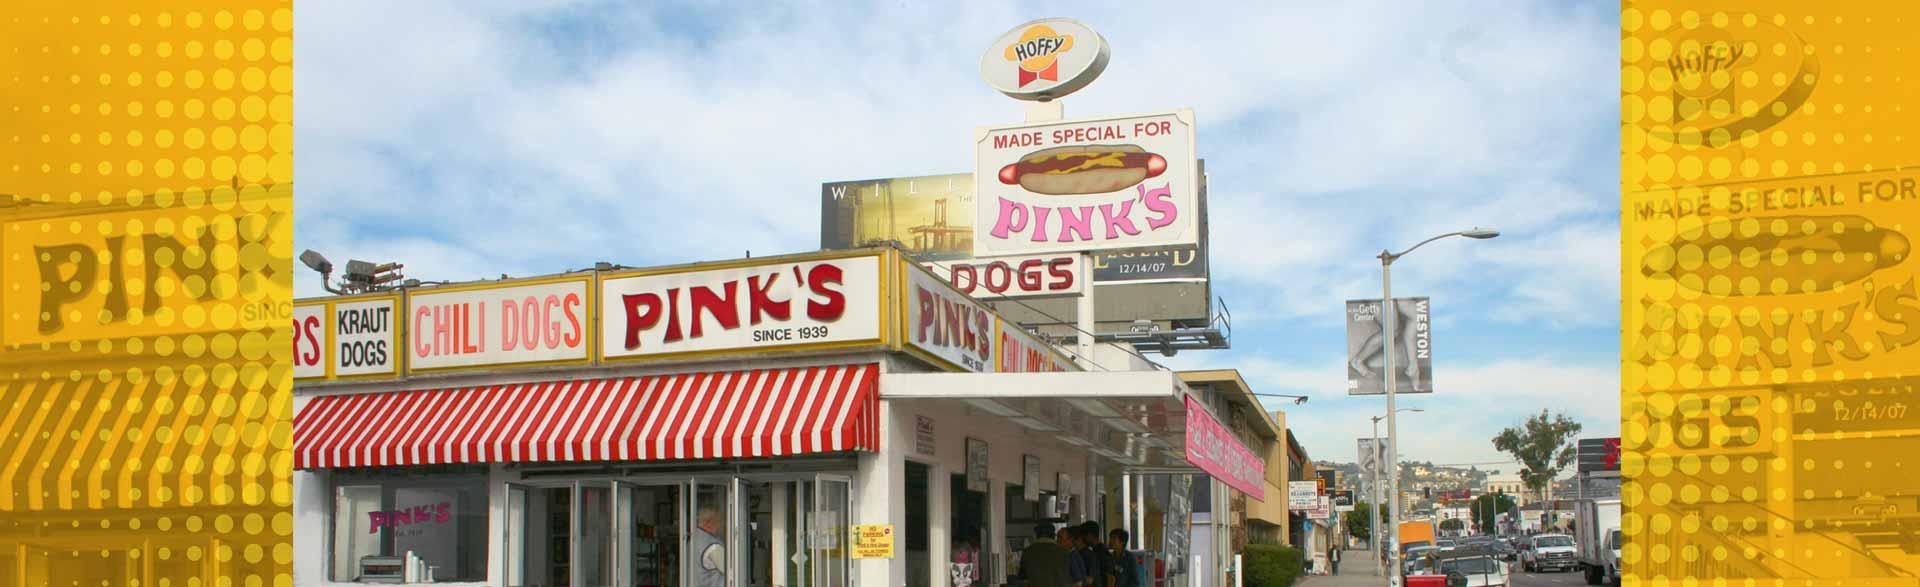 HoffyStory-002-pinks-hotdogs